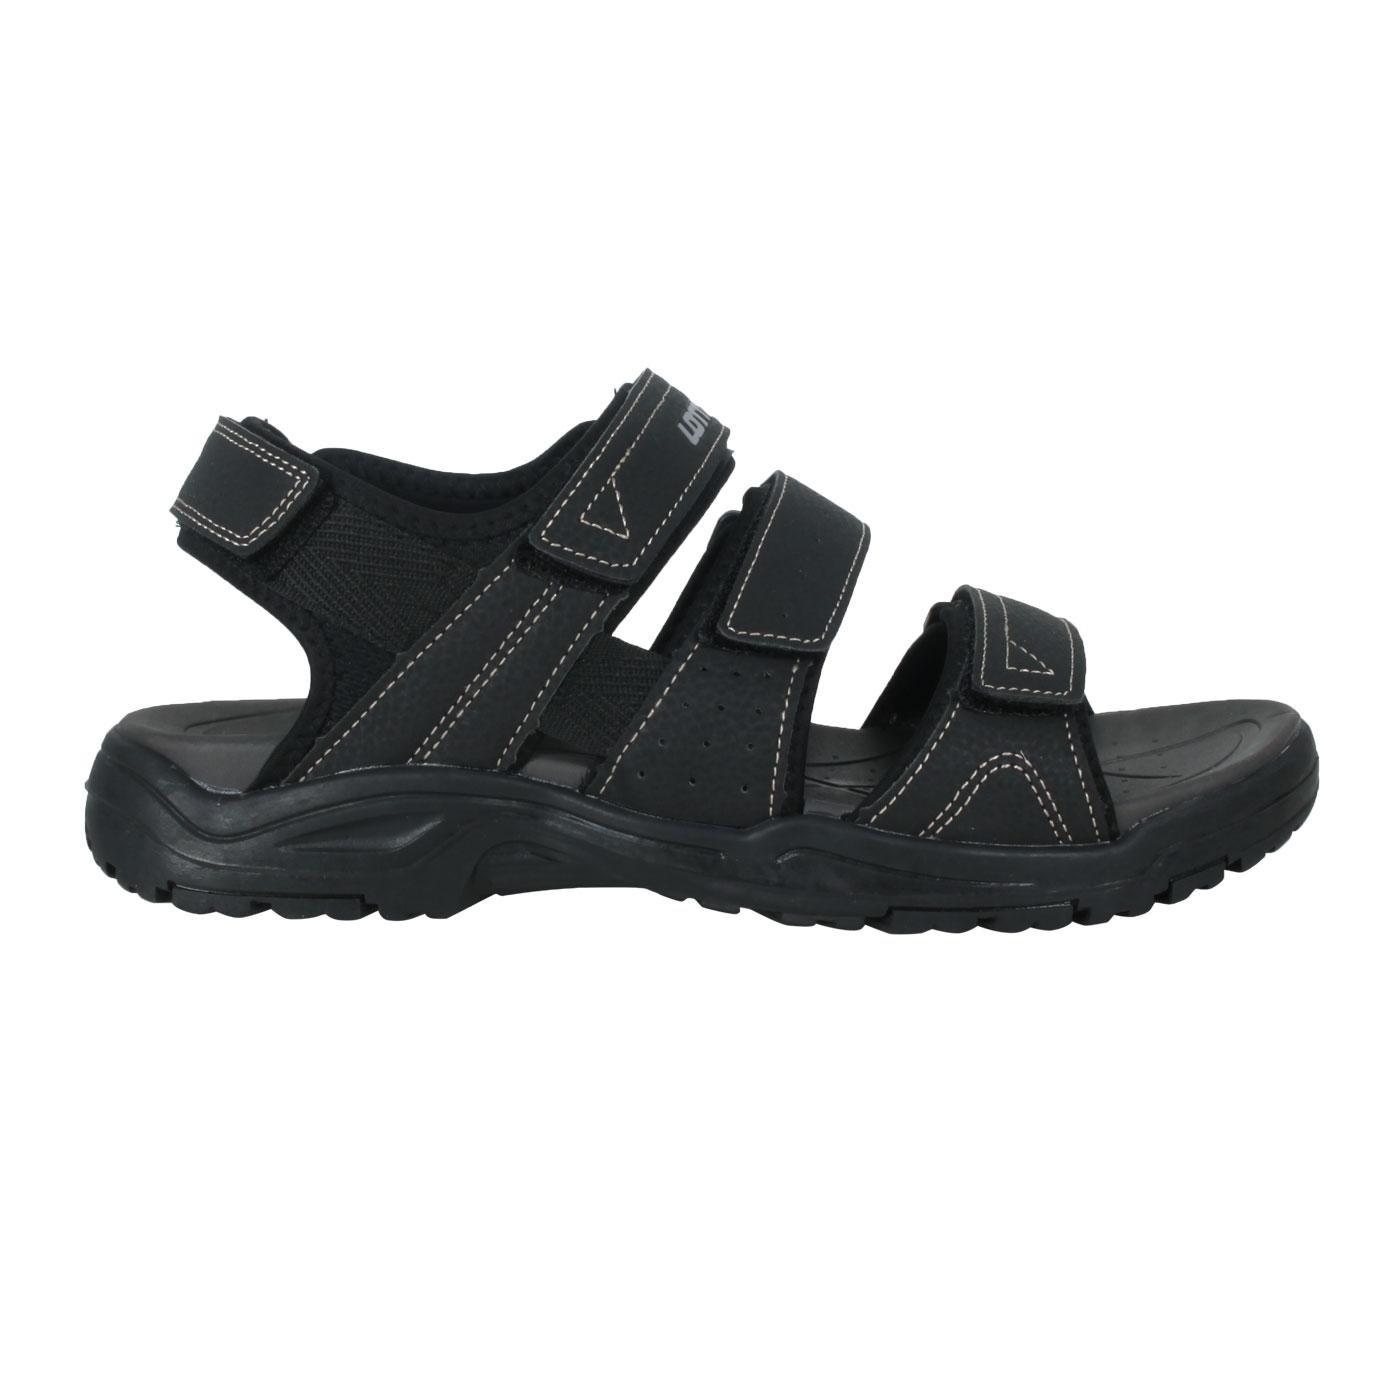 LOTTO 男款運動涼鞋 LT1AMS3350 - 黑銀